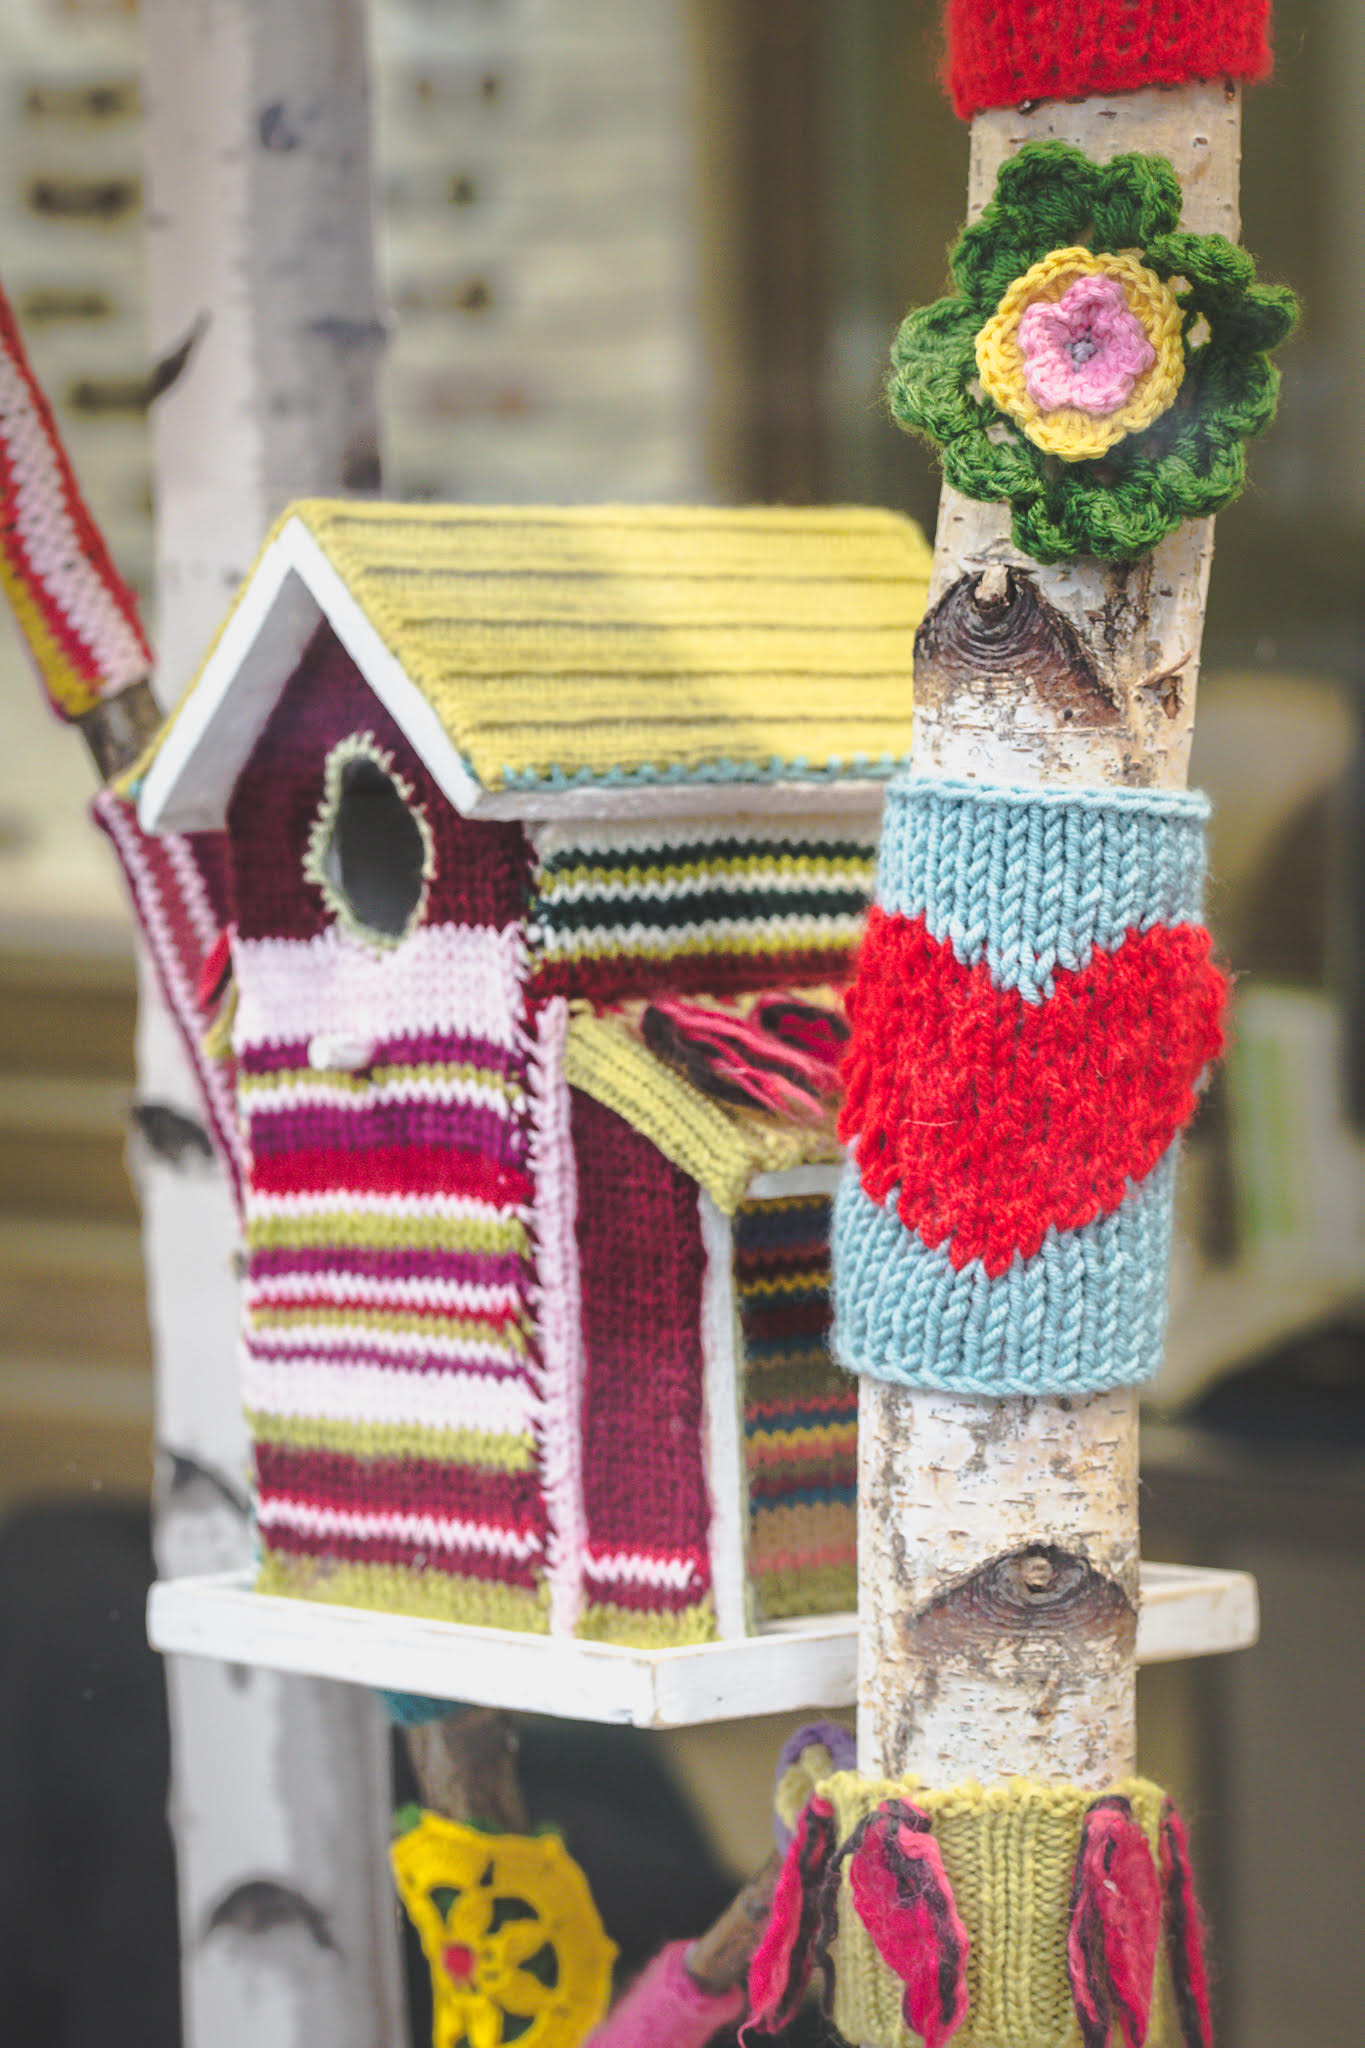 Gros plan nichoir good Yarn Bombing-la-decotheque-catherine-Cardin